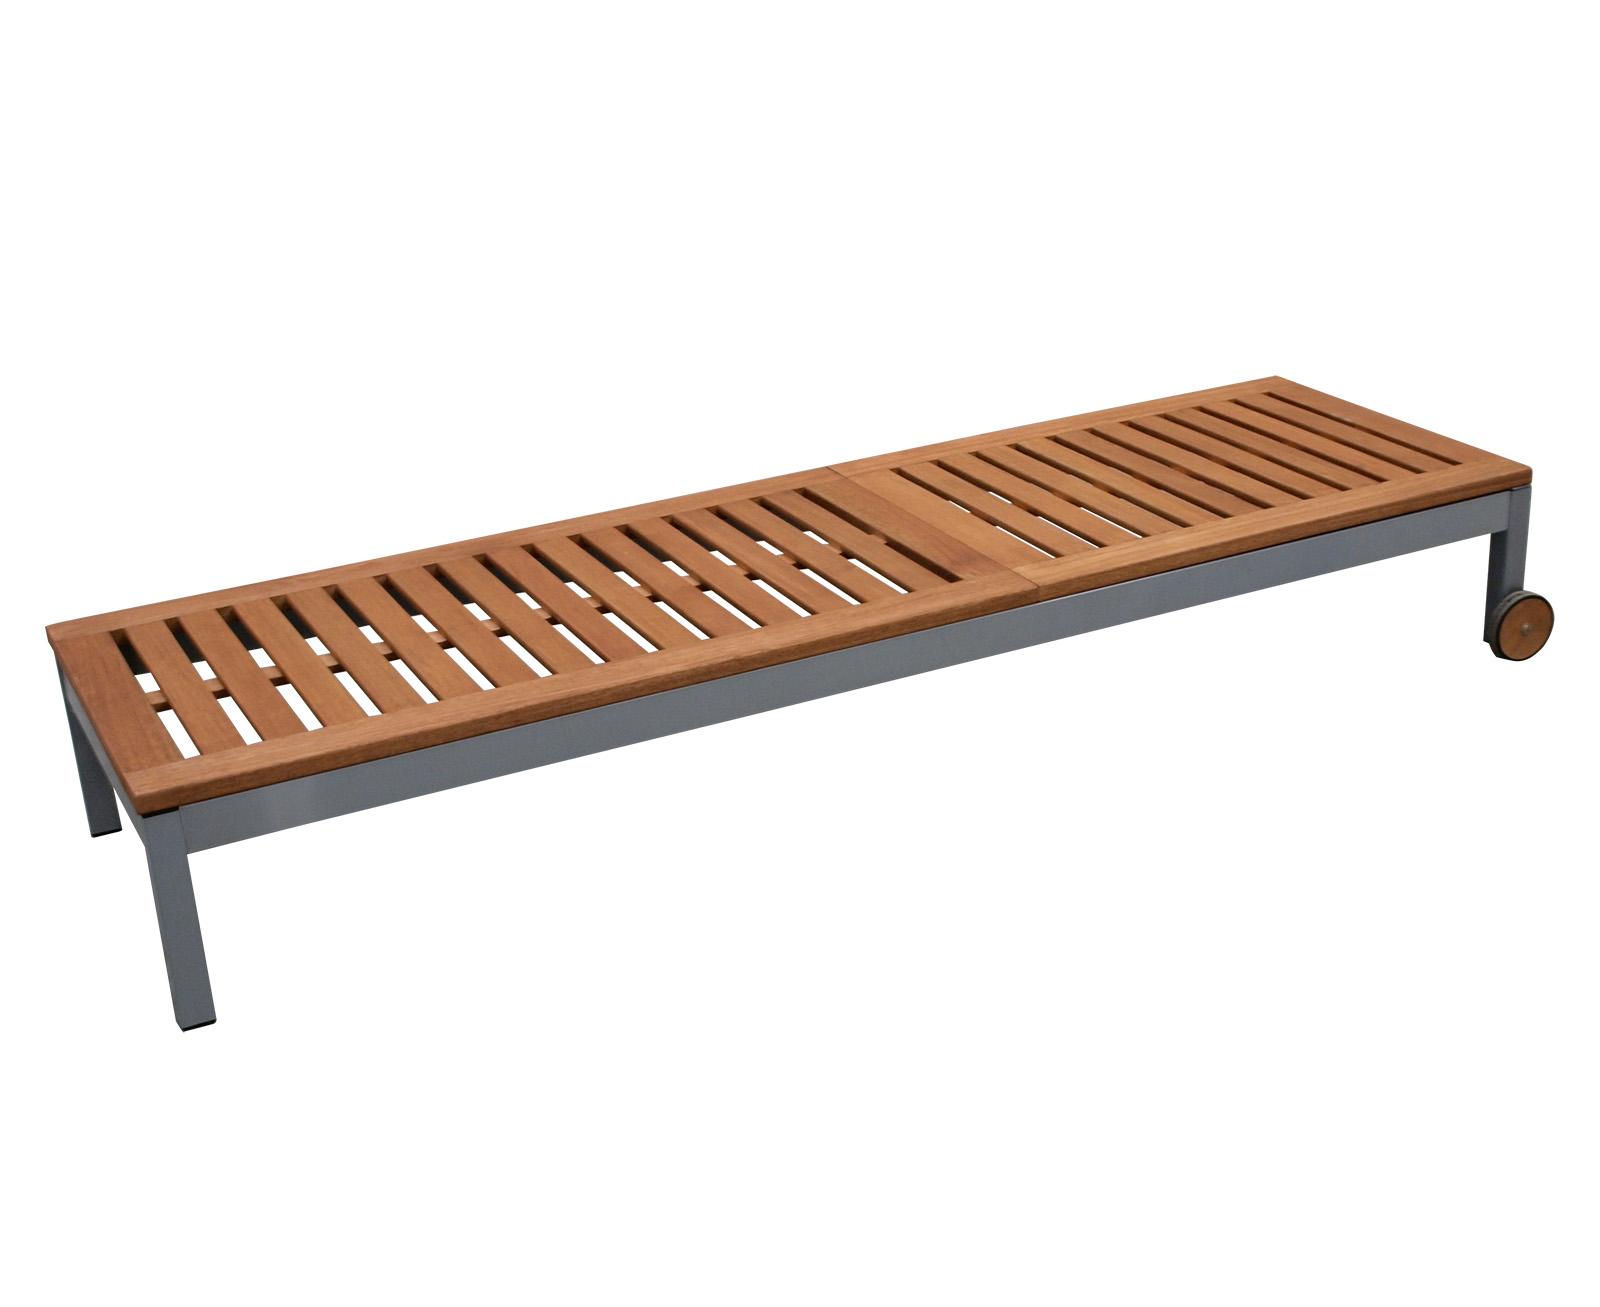 sonnenliege rollenliege gartenliege liege santiago metall eukalyptus 2 wahl ebay. Black Bedroom Furniture Sets. Home Design Ideas